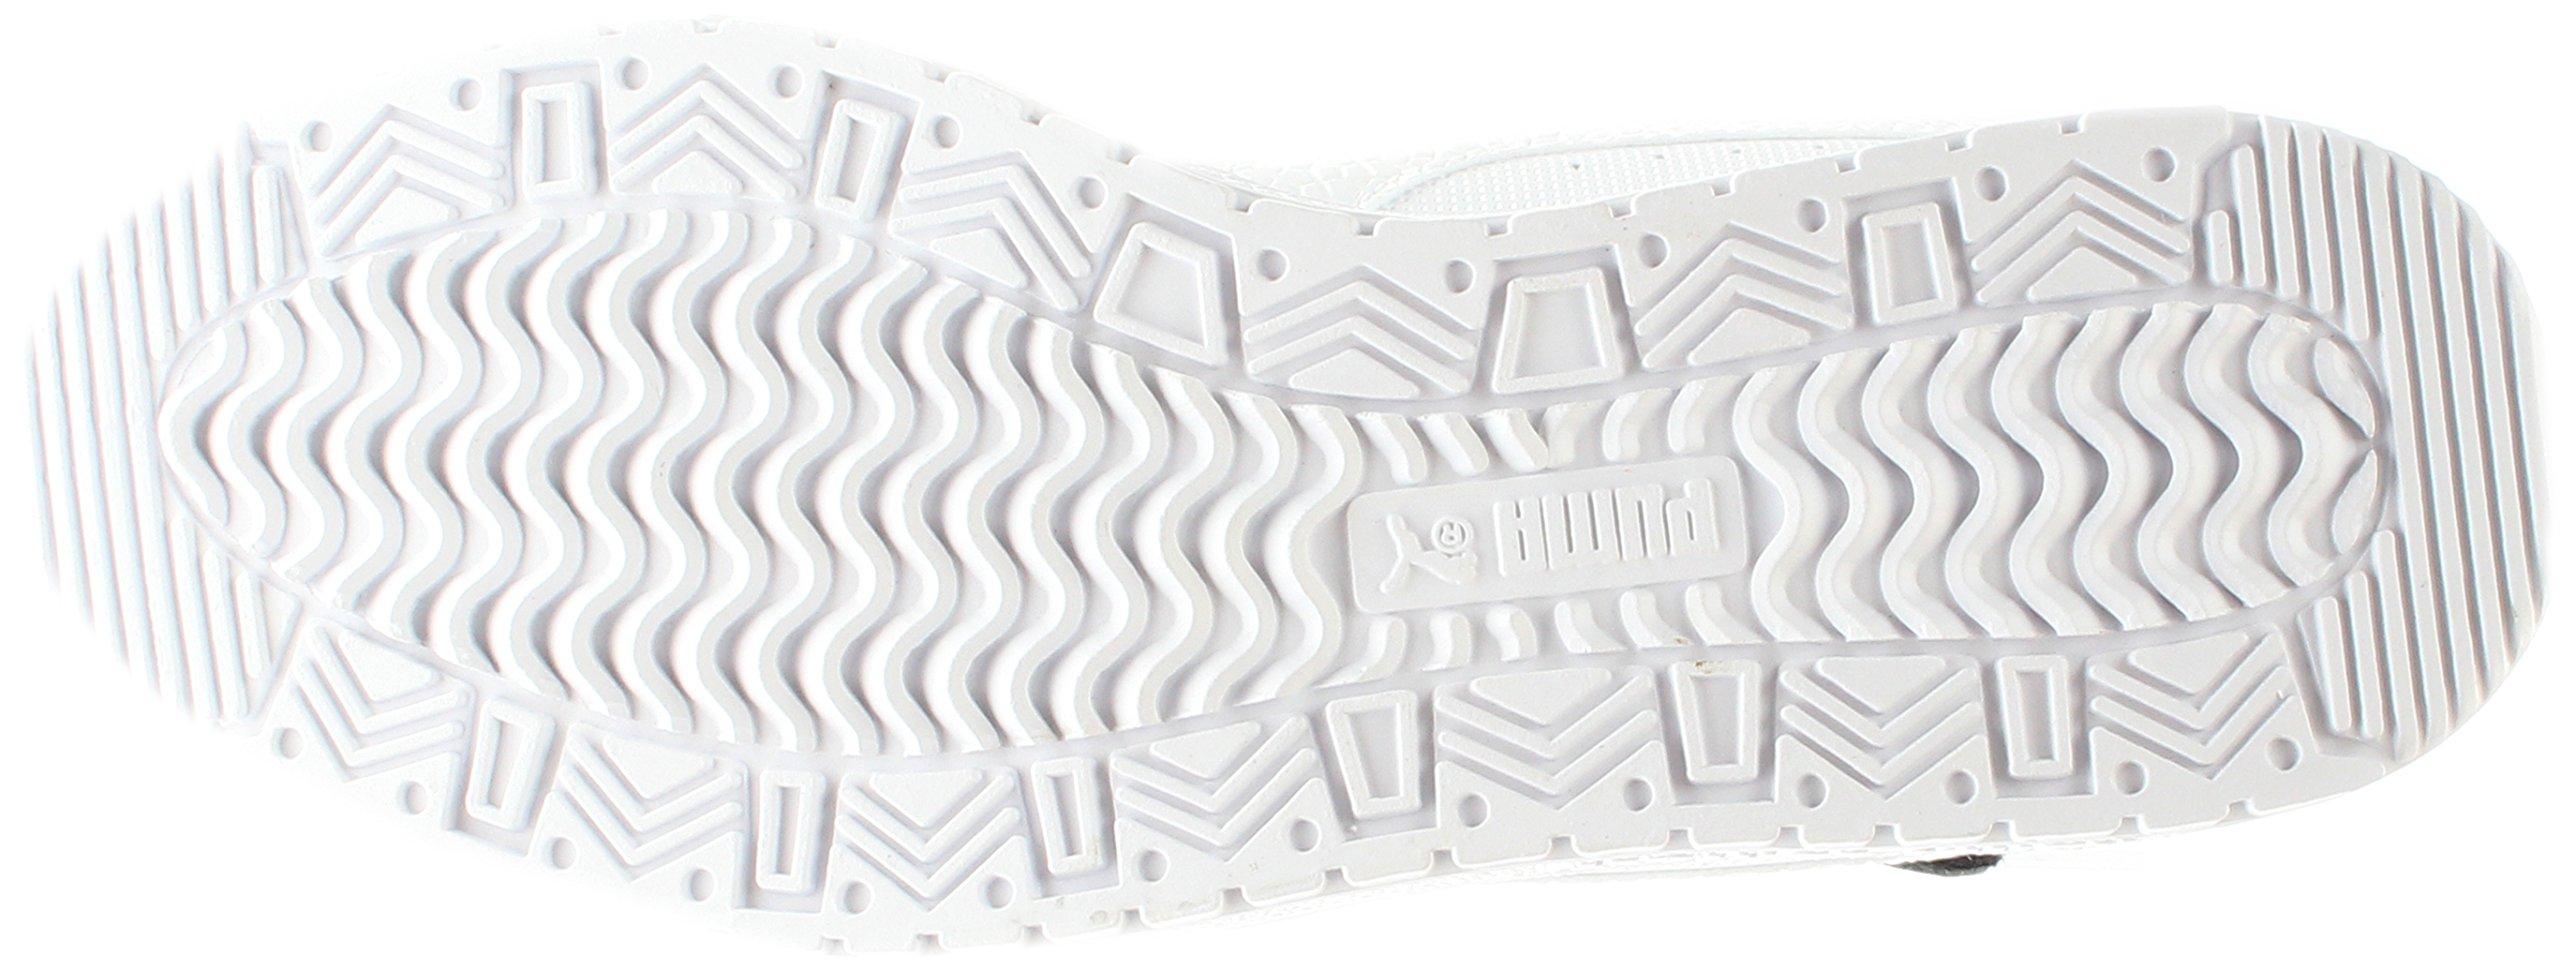 PUMA Women's Sky Ii Hi Sf Texture WN's Basketball Shoe, White Black, 8.5 M US by PUMA (Image #7)